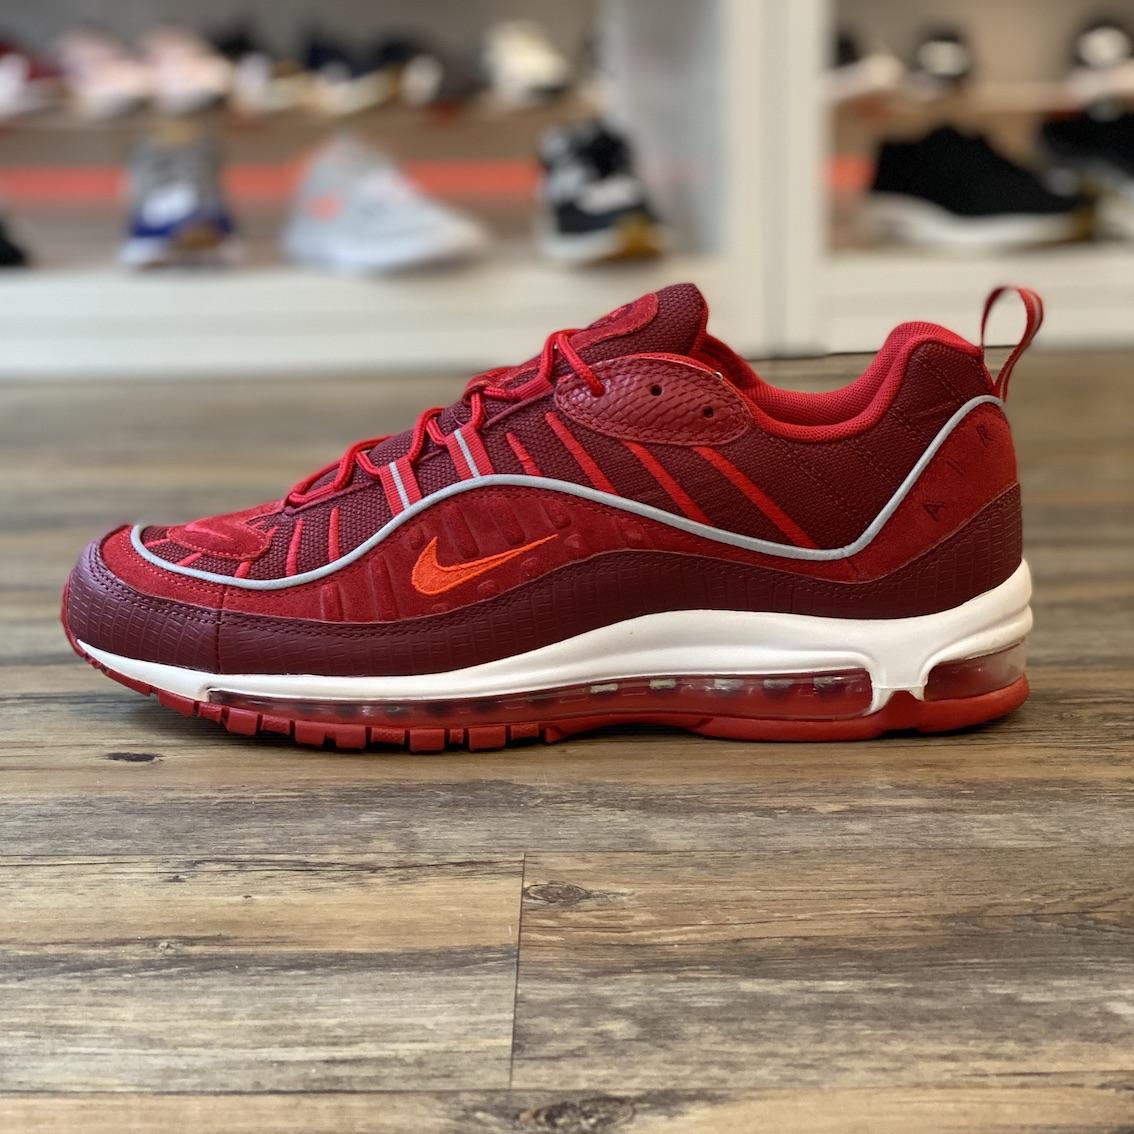 Detalles de Nike Air Max 98 Gr.45, 5 Zapatillas Deportivas Rojo Running AO9380 600 Hombre